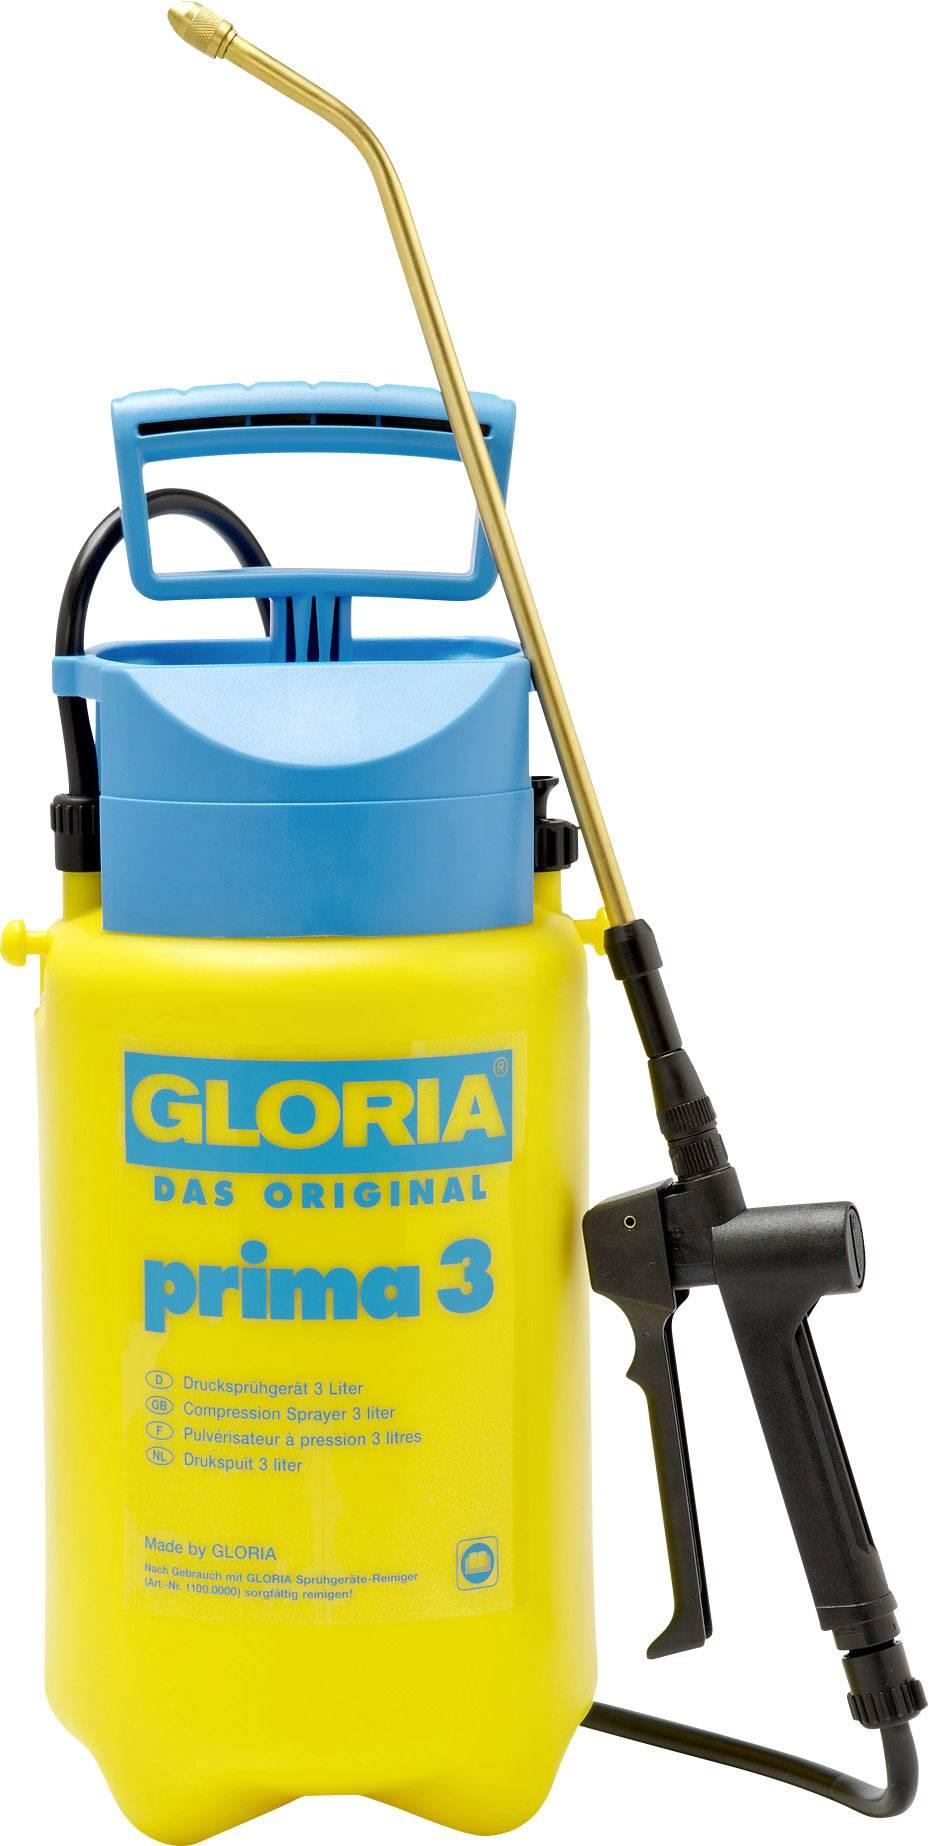 GLORIA Drucksprüher prima 5 Comfort 5 Liter